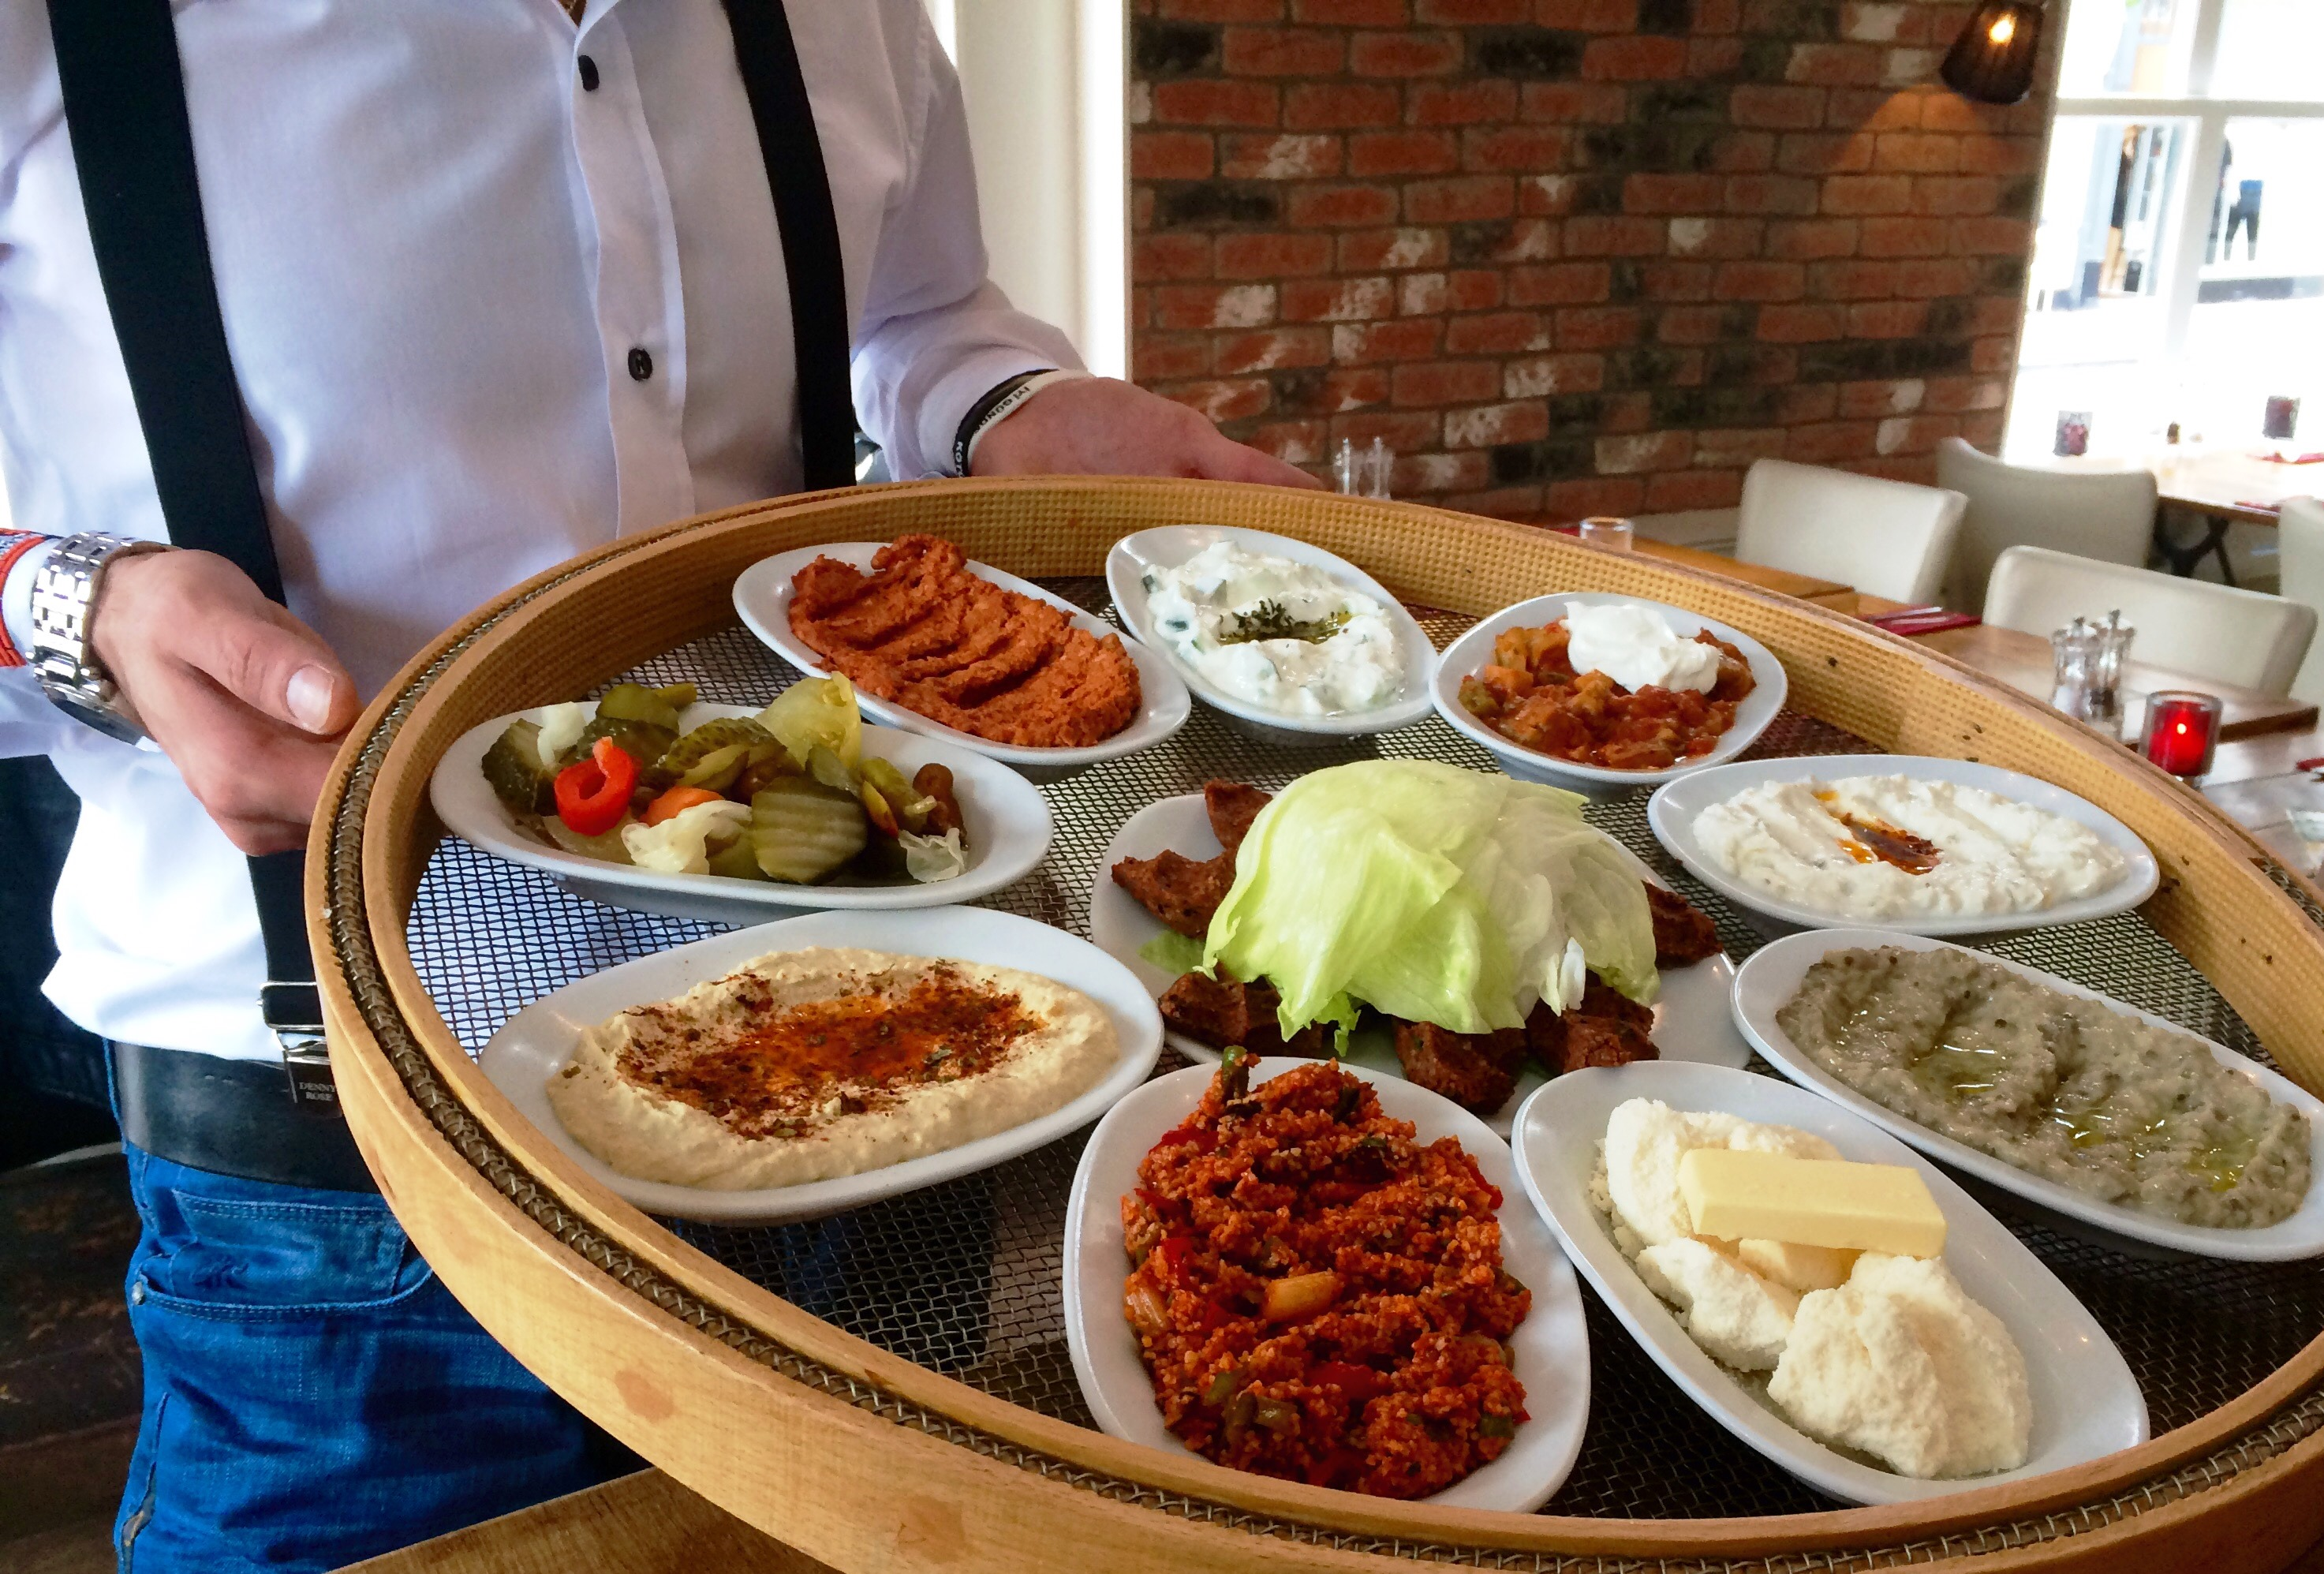 Amsterdam food news gin neo bistro ali ocakbasi shirkhan for Ocakbasi amsterdam oost